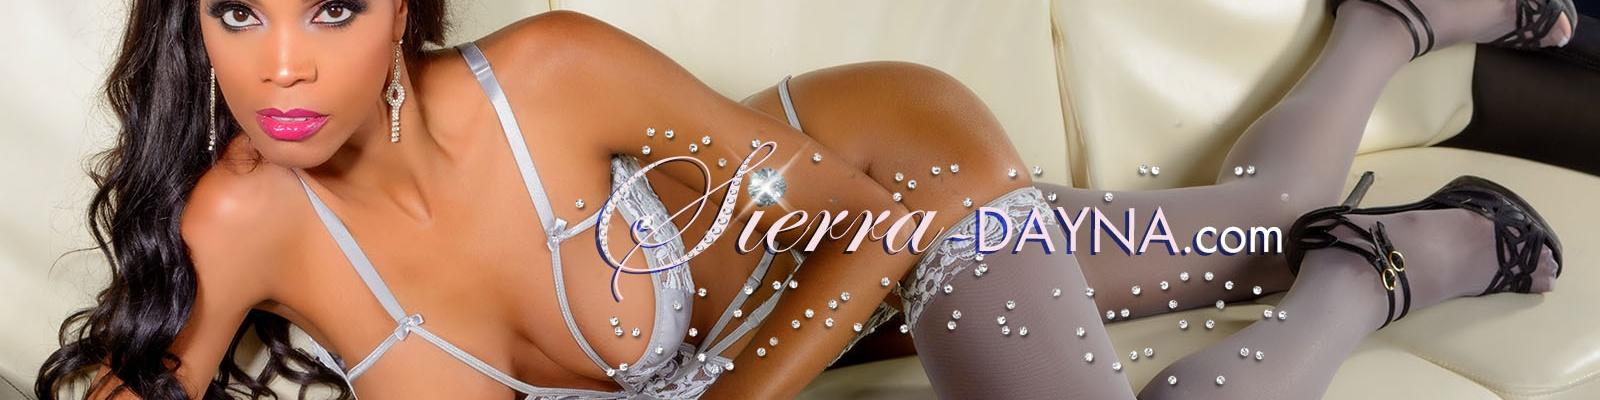 Sierra-Dayna's Cover Photo